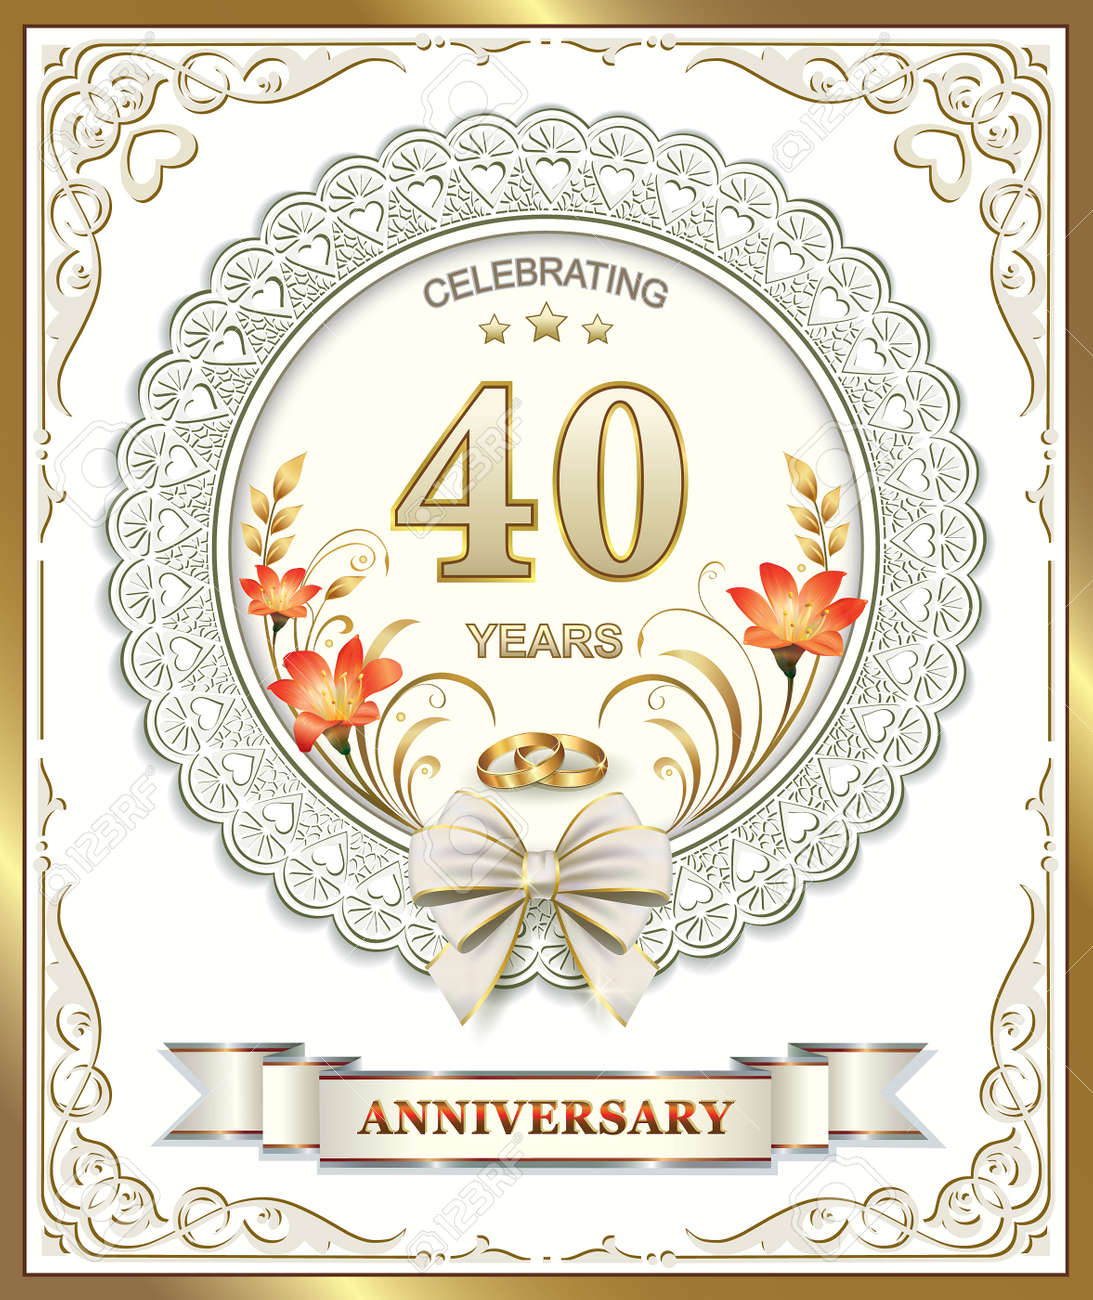 Auguri X L Anniversario Di Matrimonio.Greeting Card For 40 Wedding Anniversary With Lilies And Rings